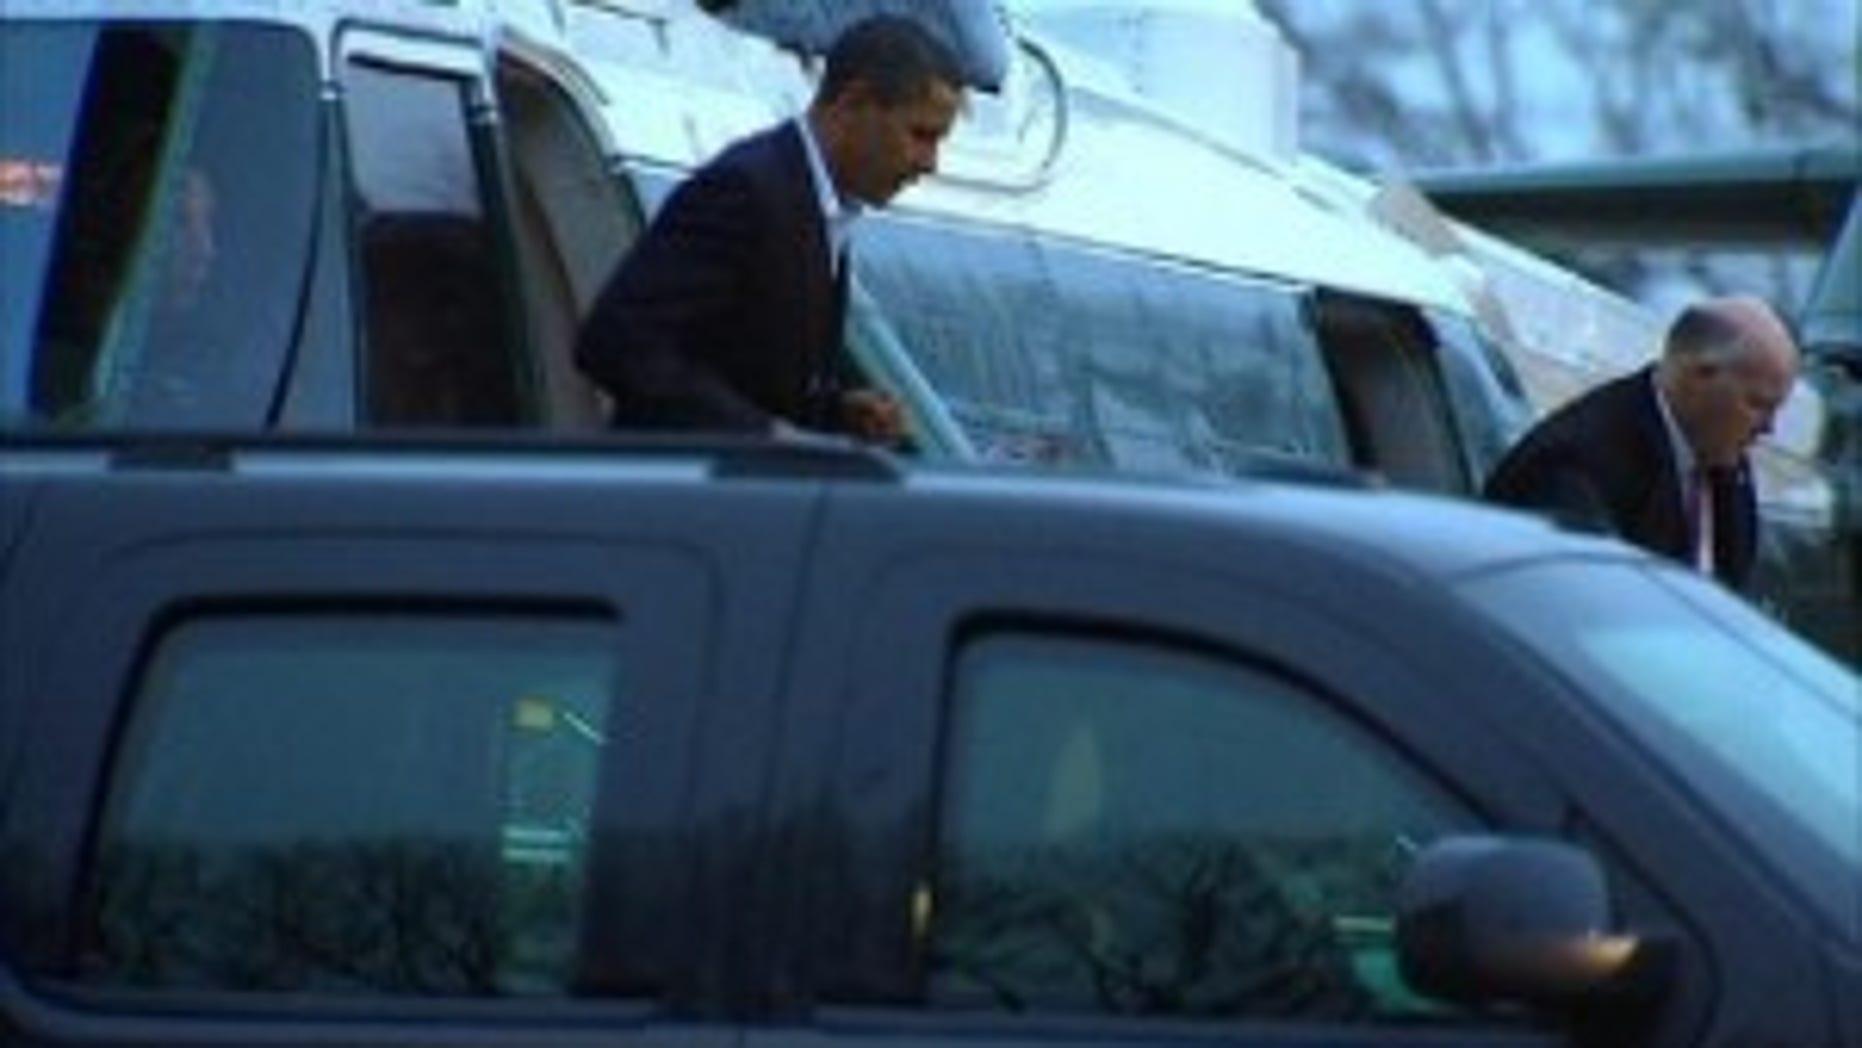 President Obama arrives at Bethesda Naval Hospital (Travel Pool Photo)